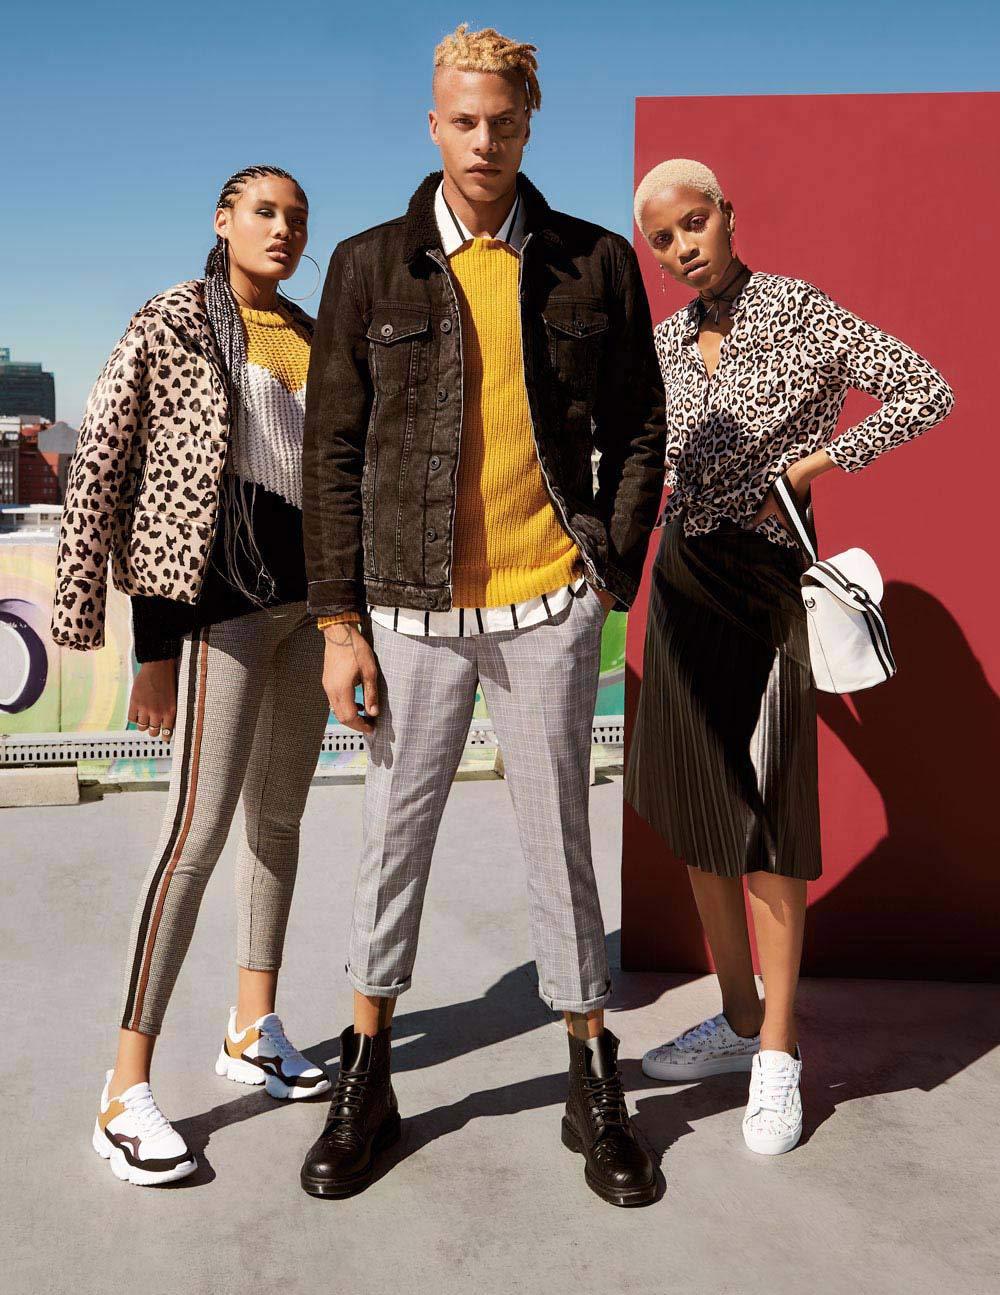 3d3ce28a6b43 LISA: Free 2BU leopard-print puffer jacket 499.95 SHOP NOW; Free 2BU  multi-coloured chunky knit 349.95 SHOP NOW; Free 2BU side-stripe leggings  299.95 SHOP ...